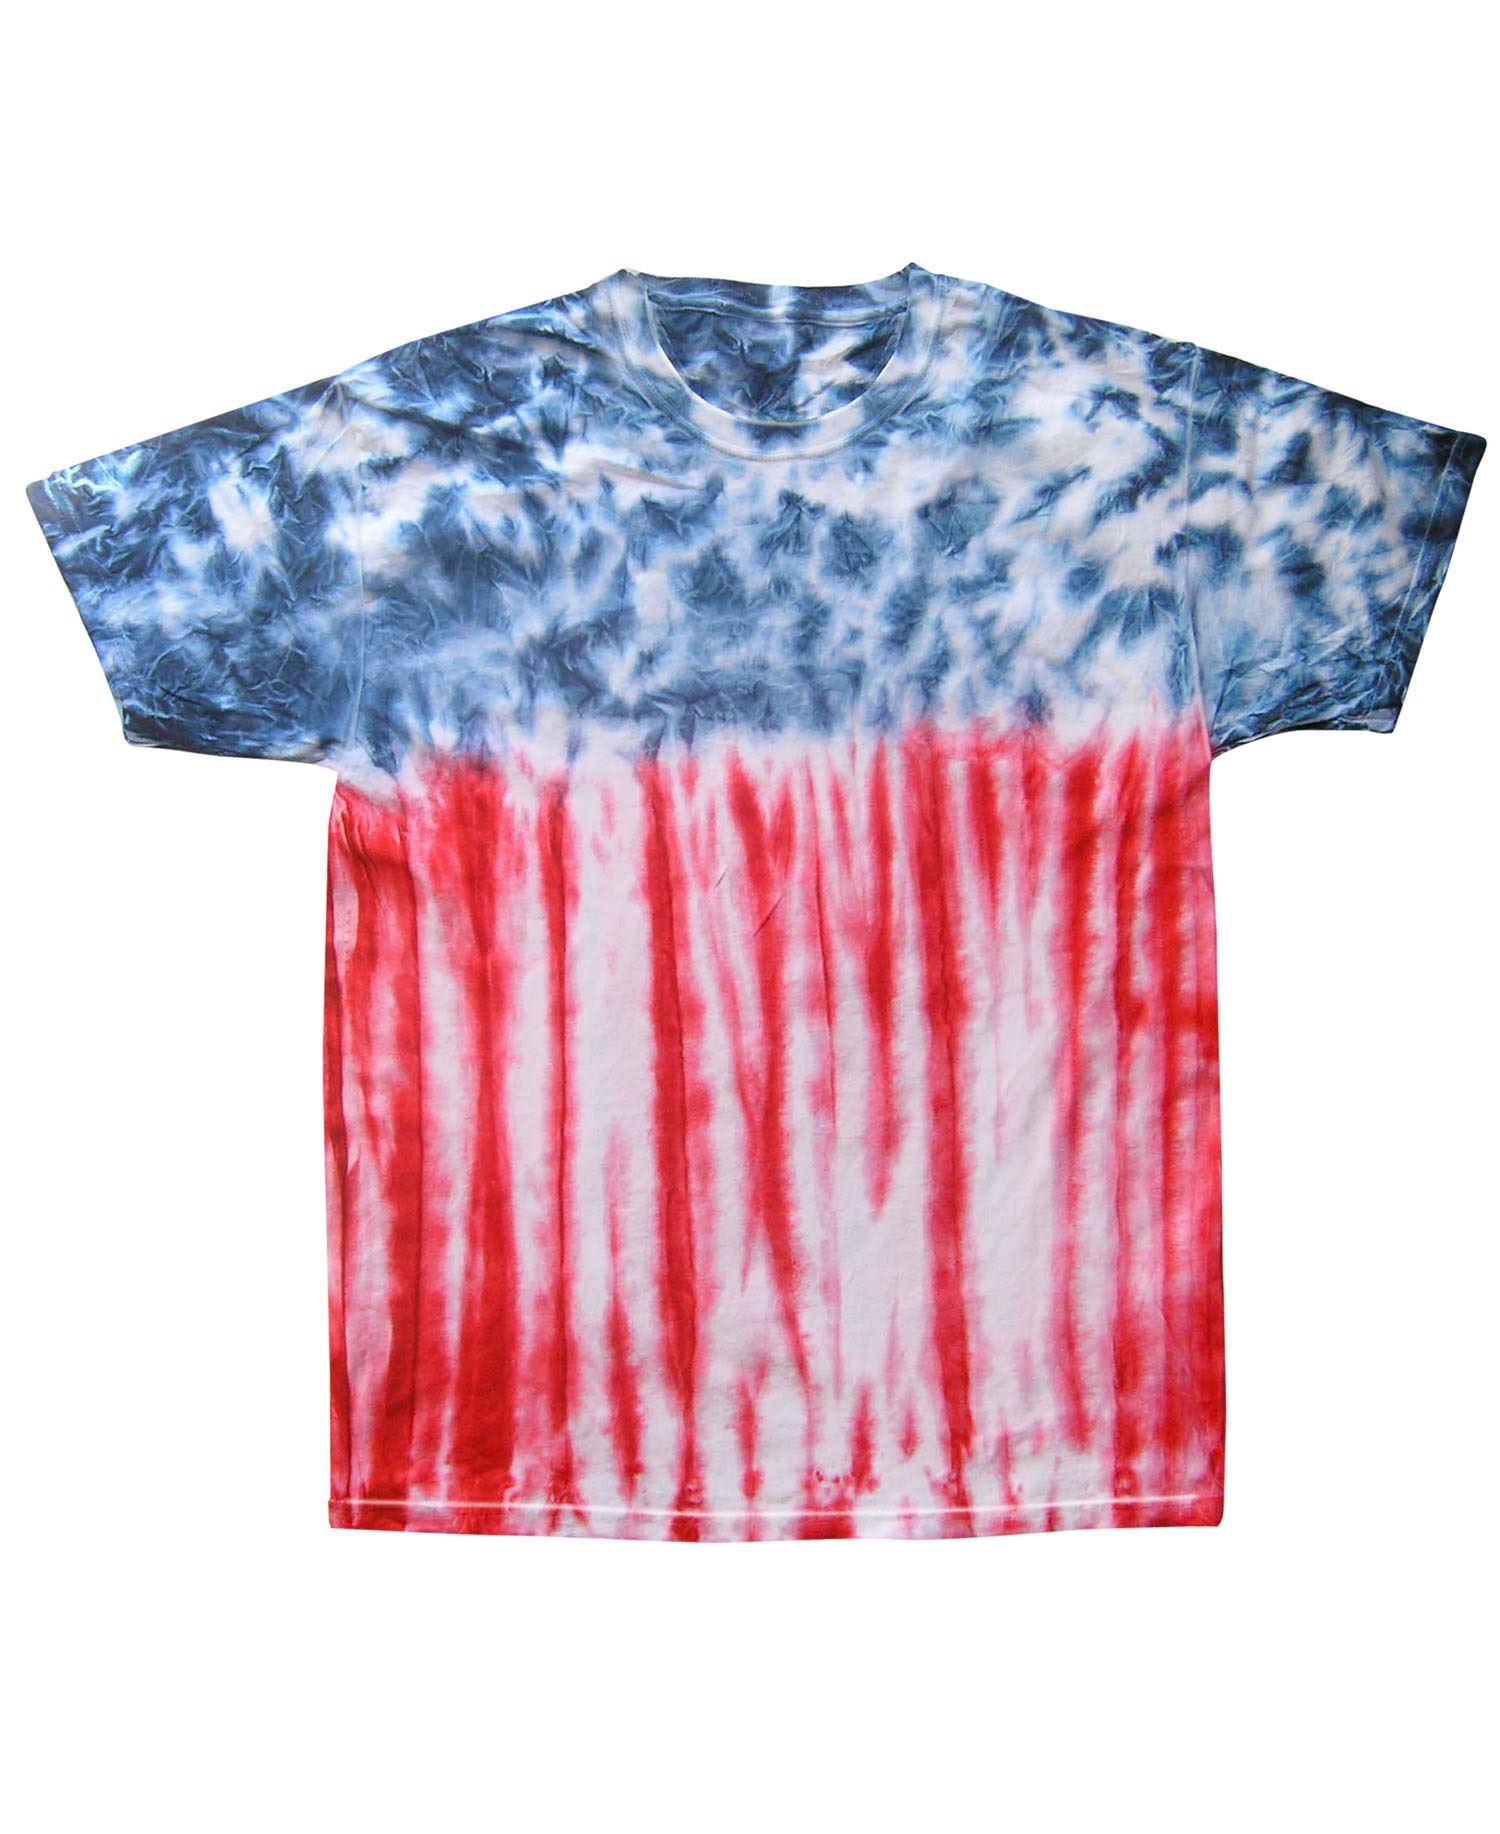 Colortone - T918P Youth Usa Flag Tie Dye Tee